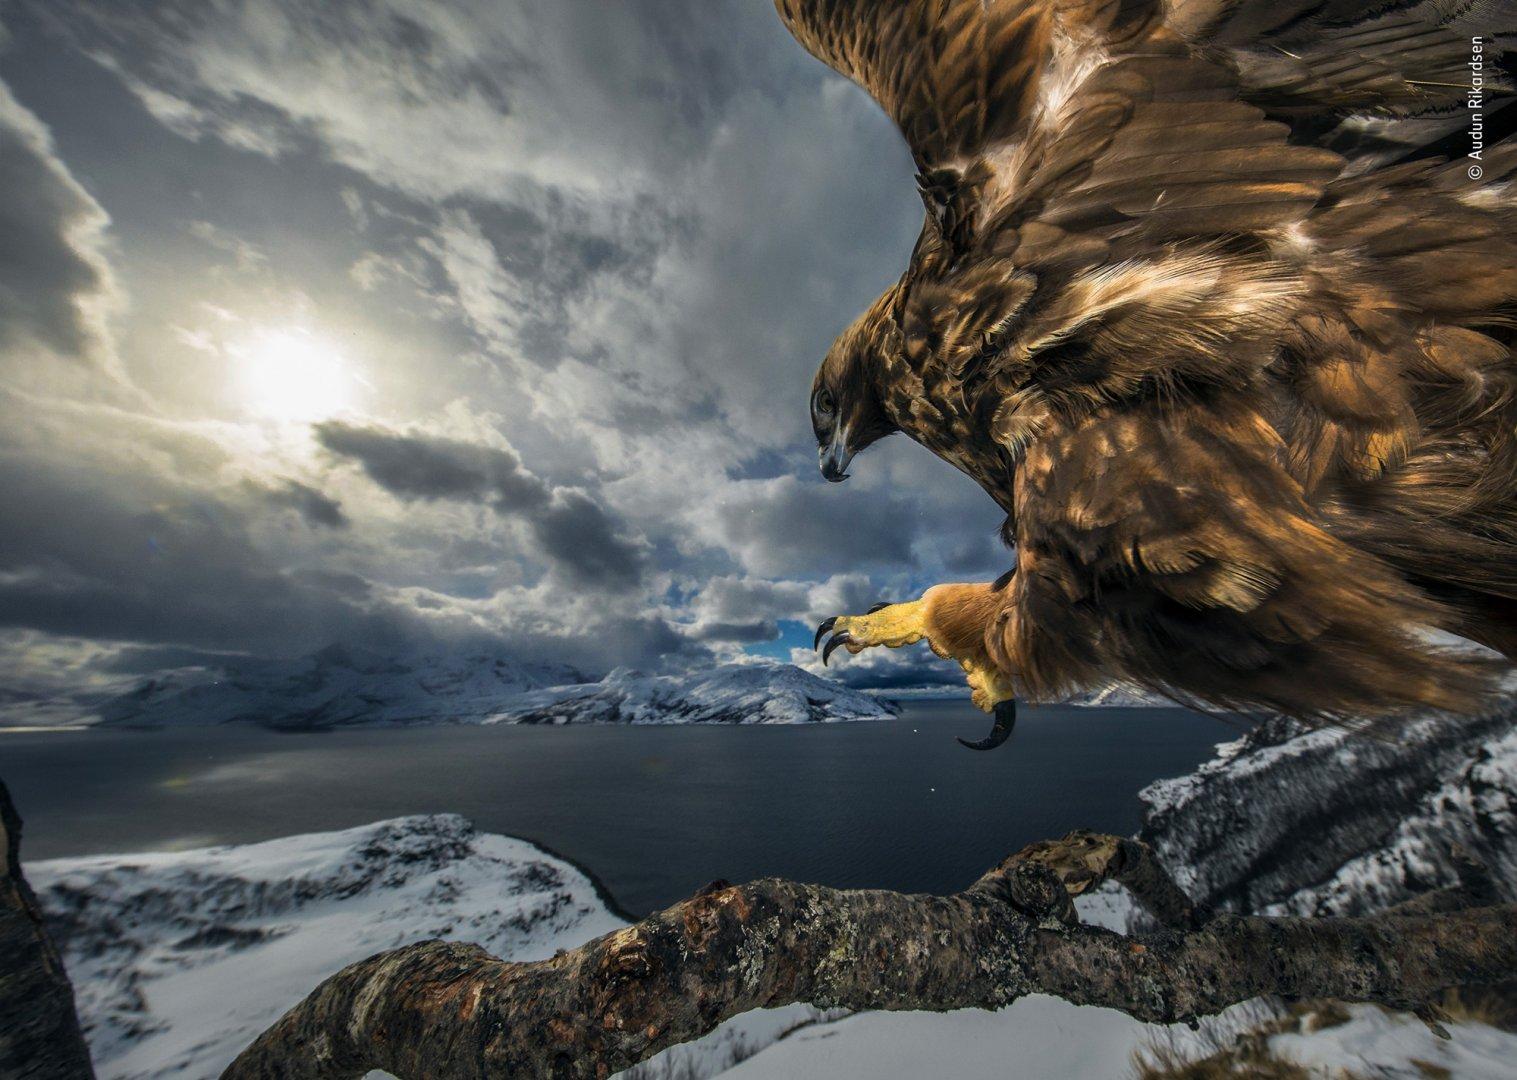 Audun-Rikardsen-Wildlife-Photographer-of-the-Year.jpg